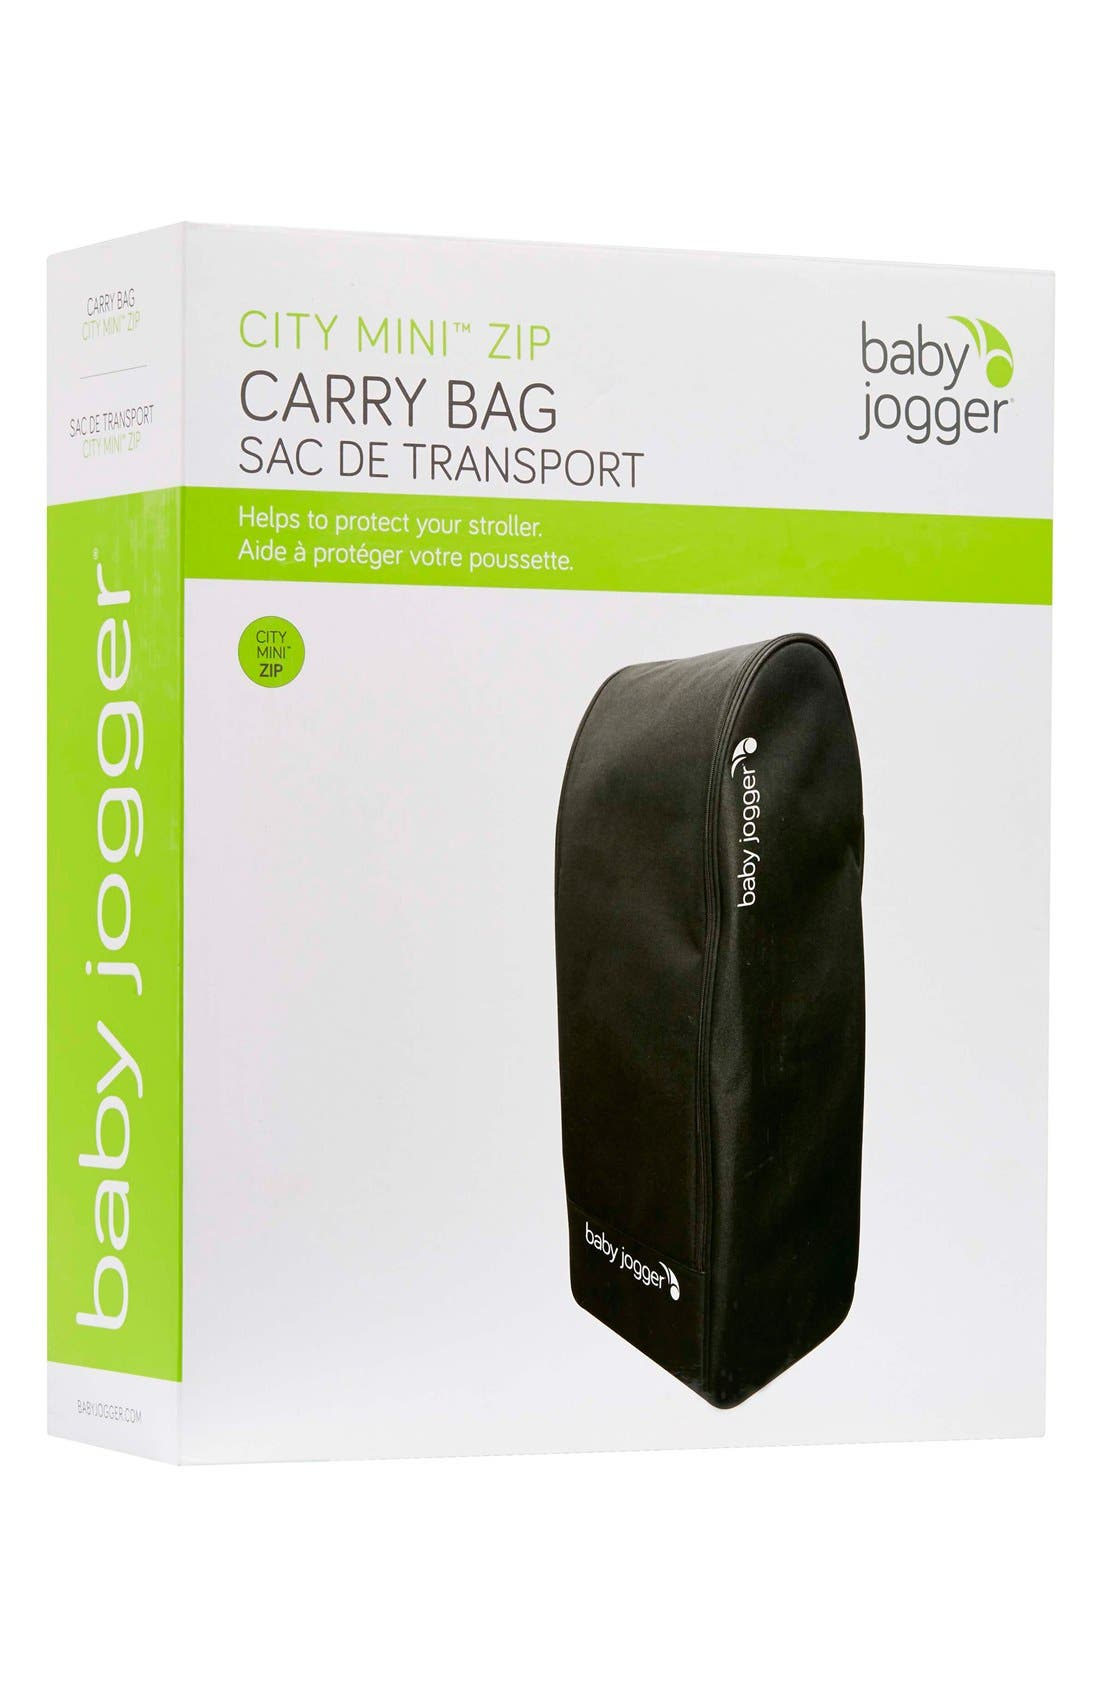 Alternate Image 3  - Baby Jogger 'City Mini® ZIP' Stroller Backpack Carry Bag